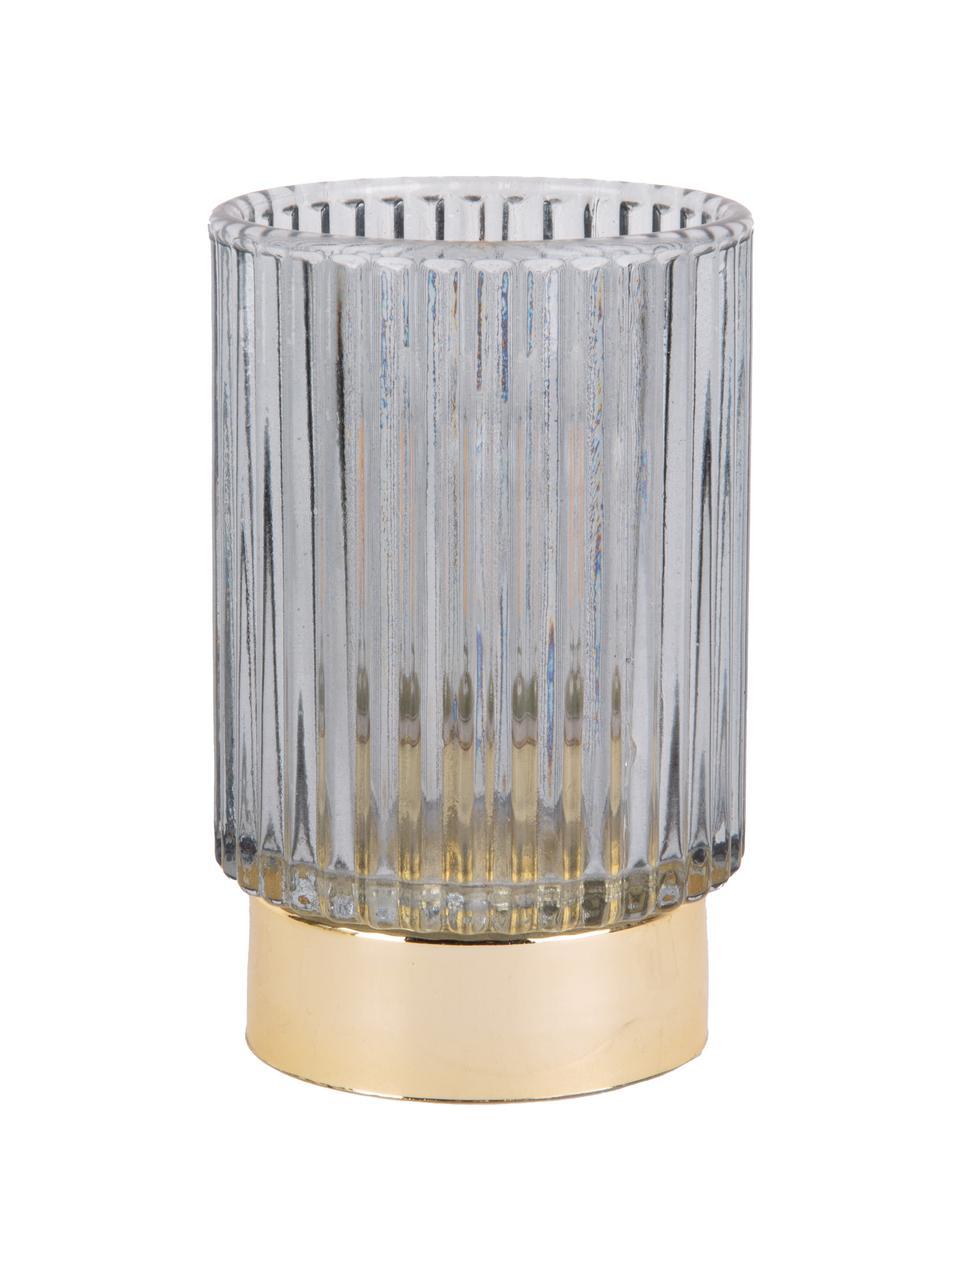 LED Teelichthalter Ribbed, Glas, Blau, Ø 9 x H 13 cm